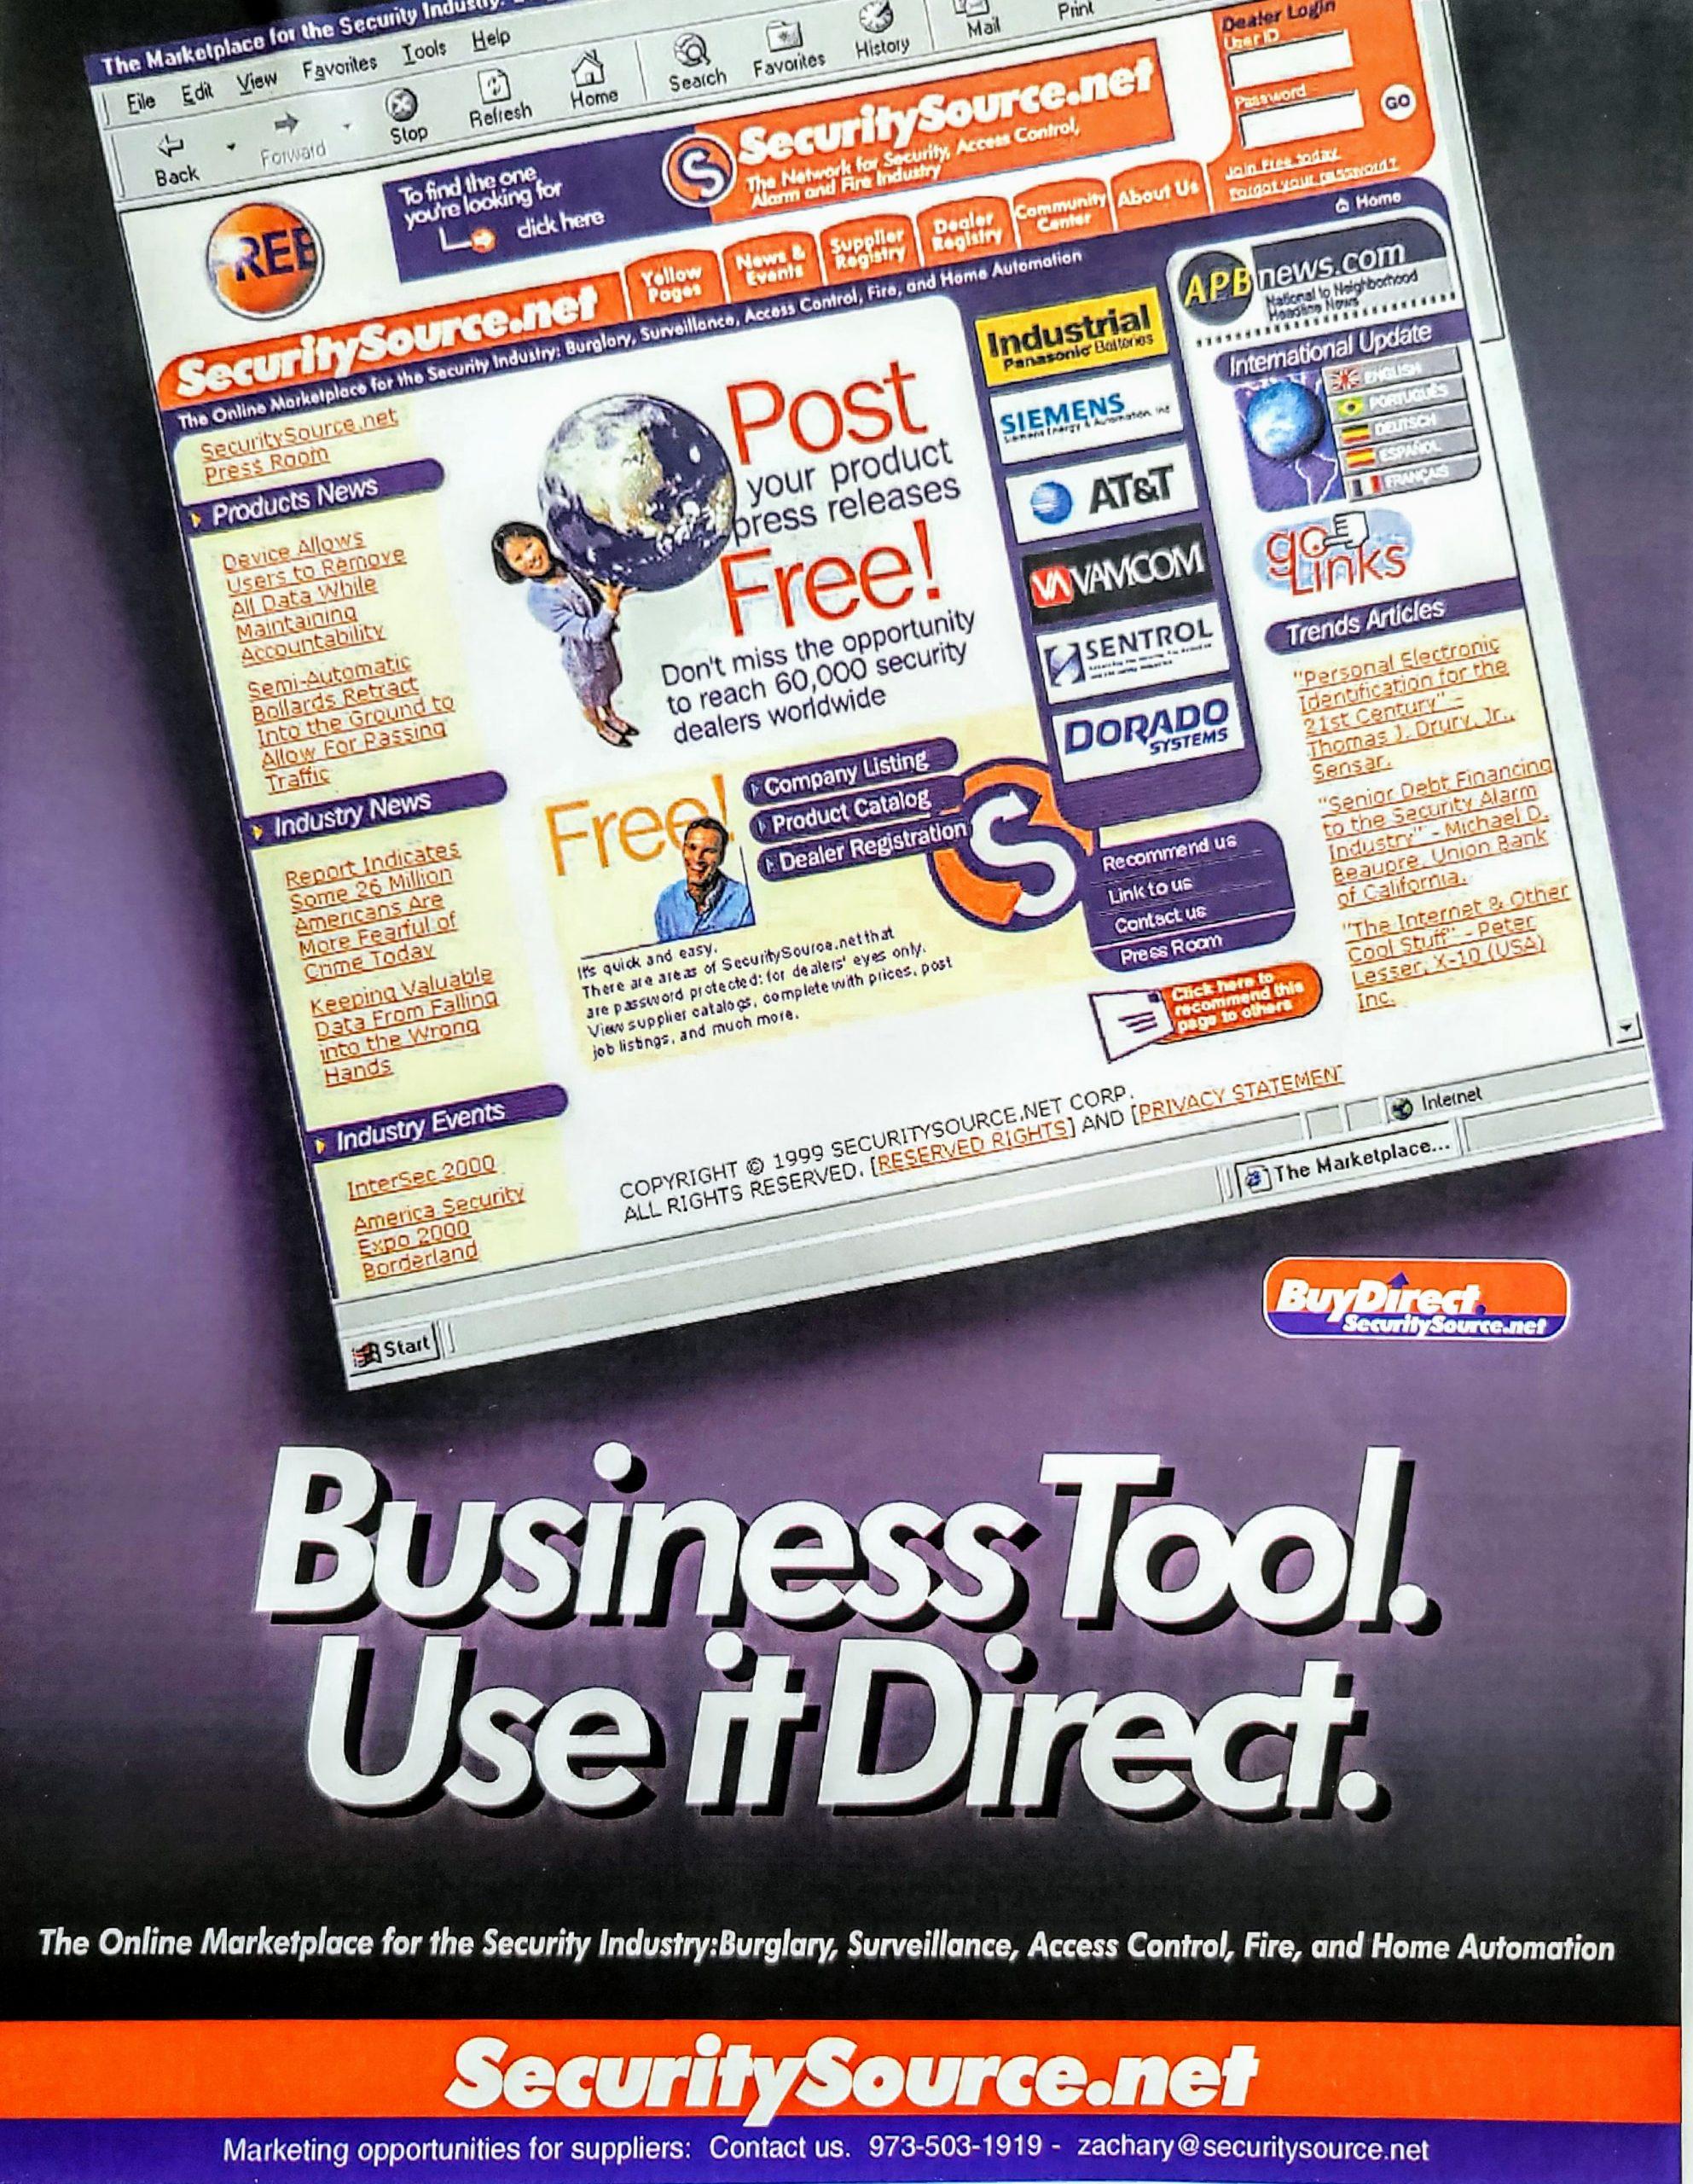 snet_securitysource_business tool_4